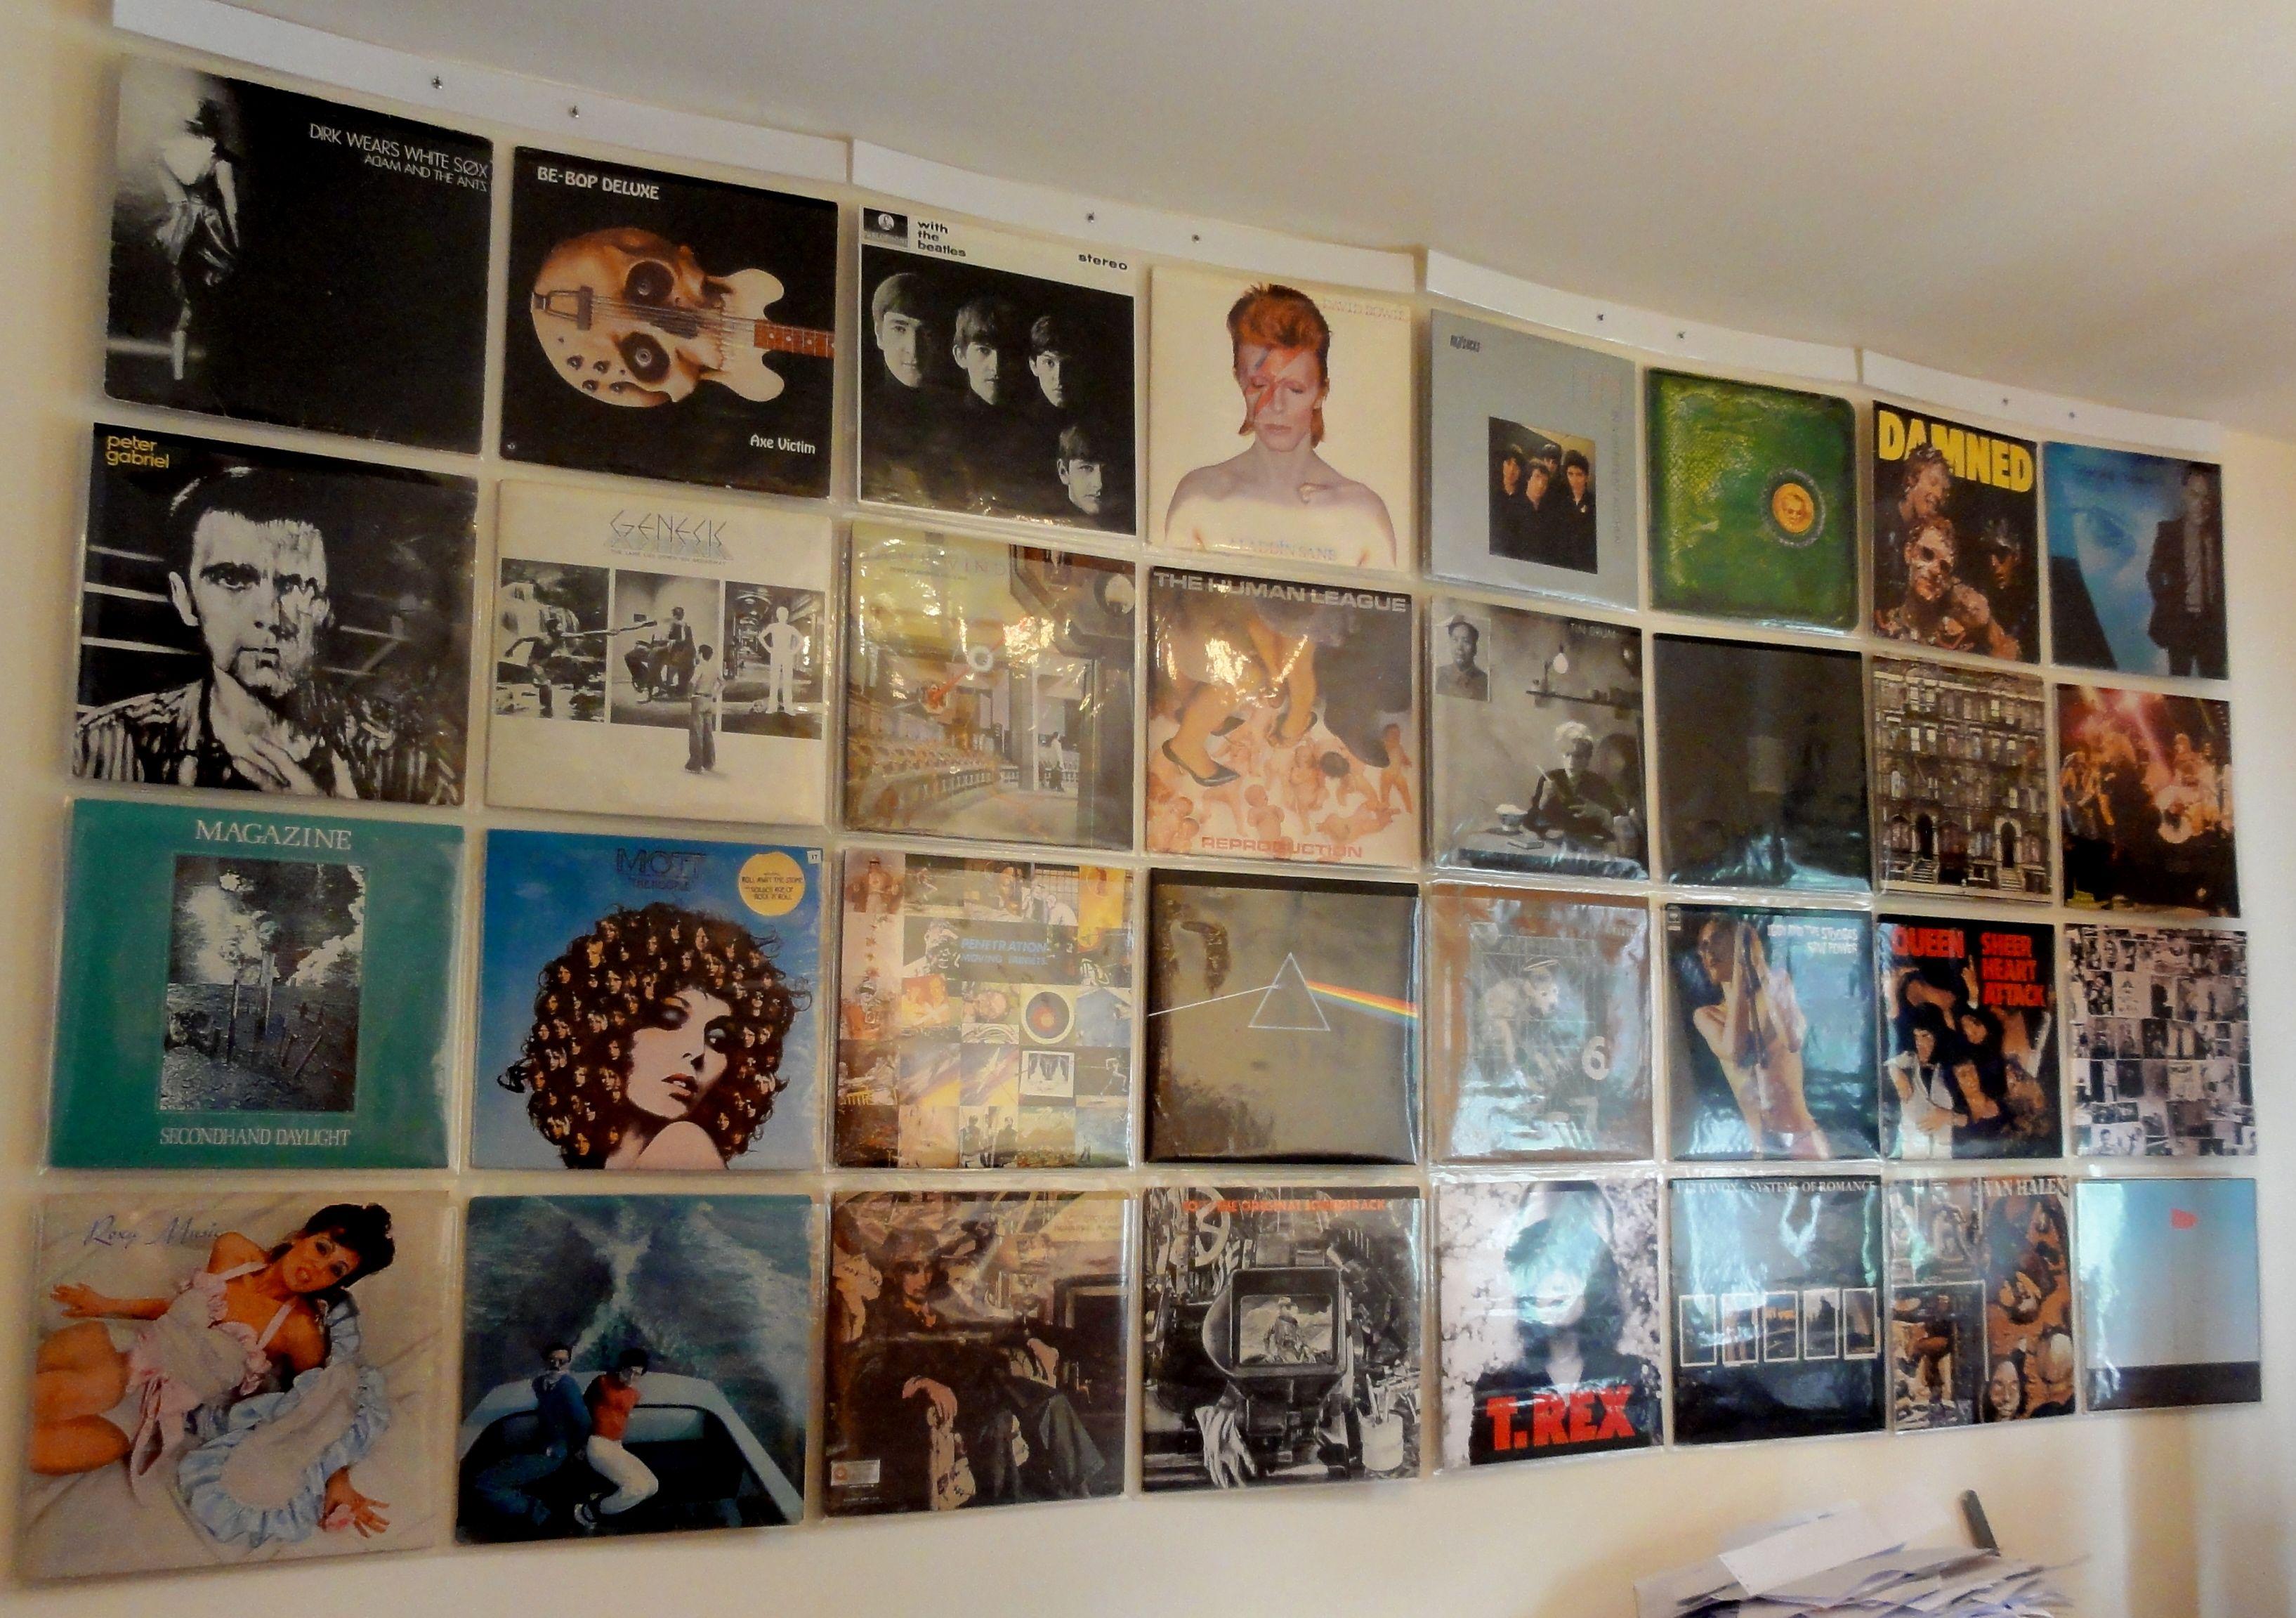 Wall Of Sound Number 1 Vinyl Album Lp Covers Vinyl Record Shop Vinyl Wall Art Vinyl